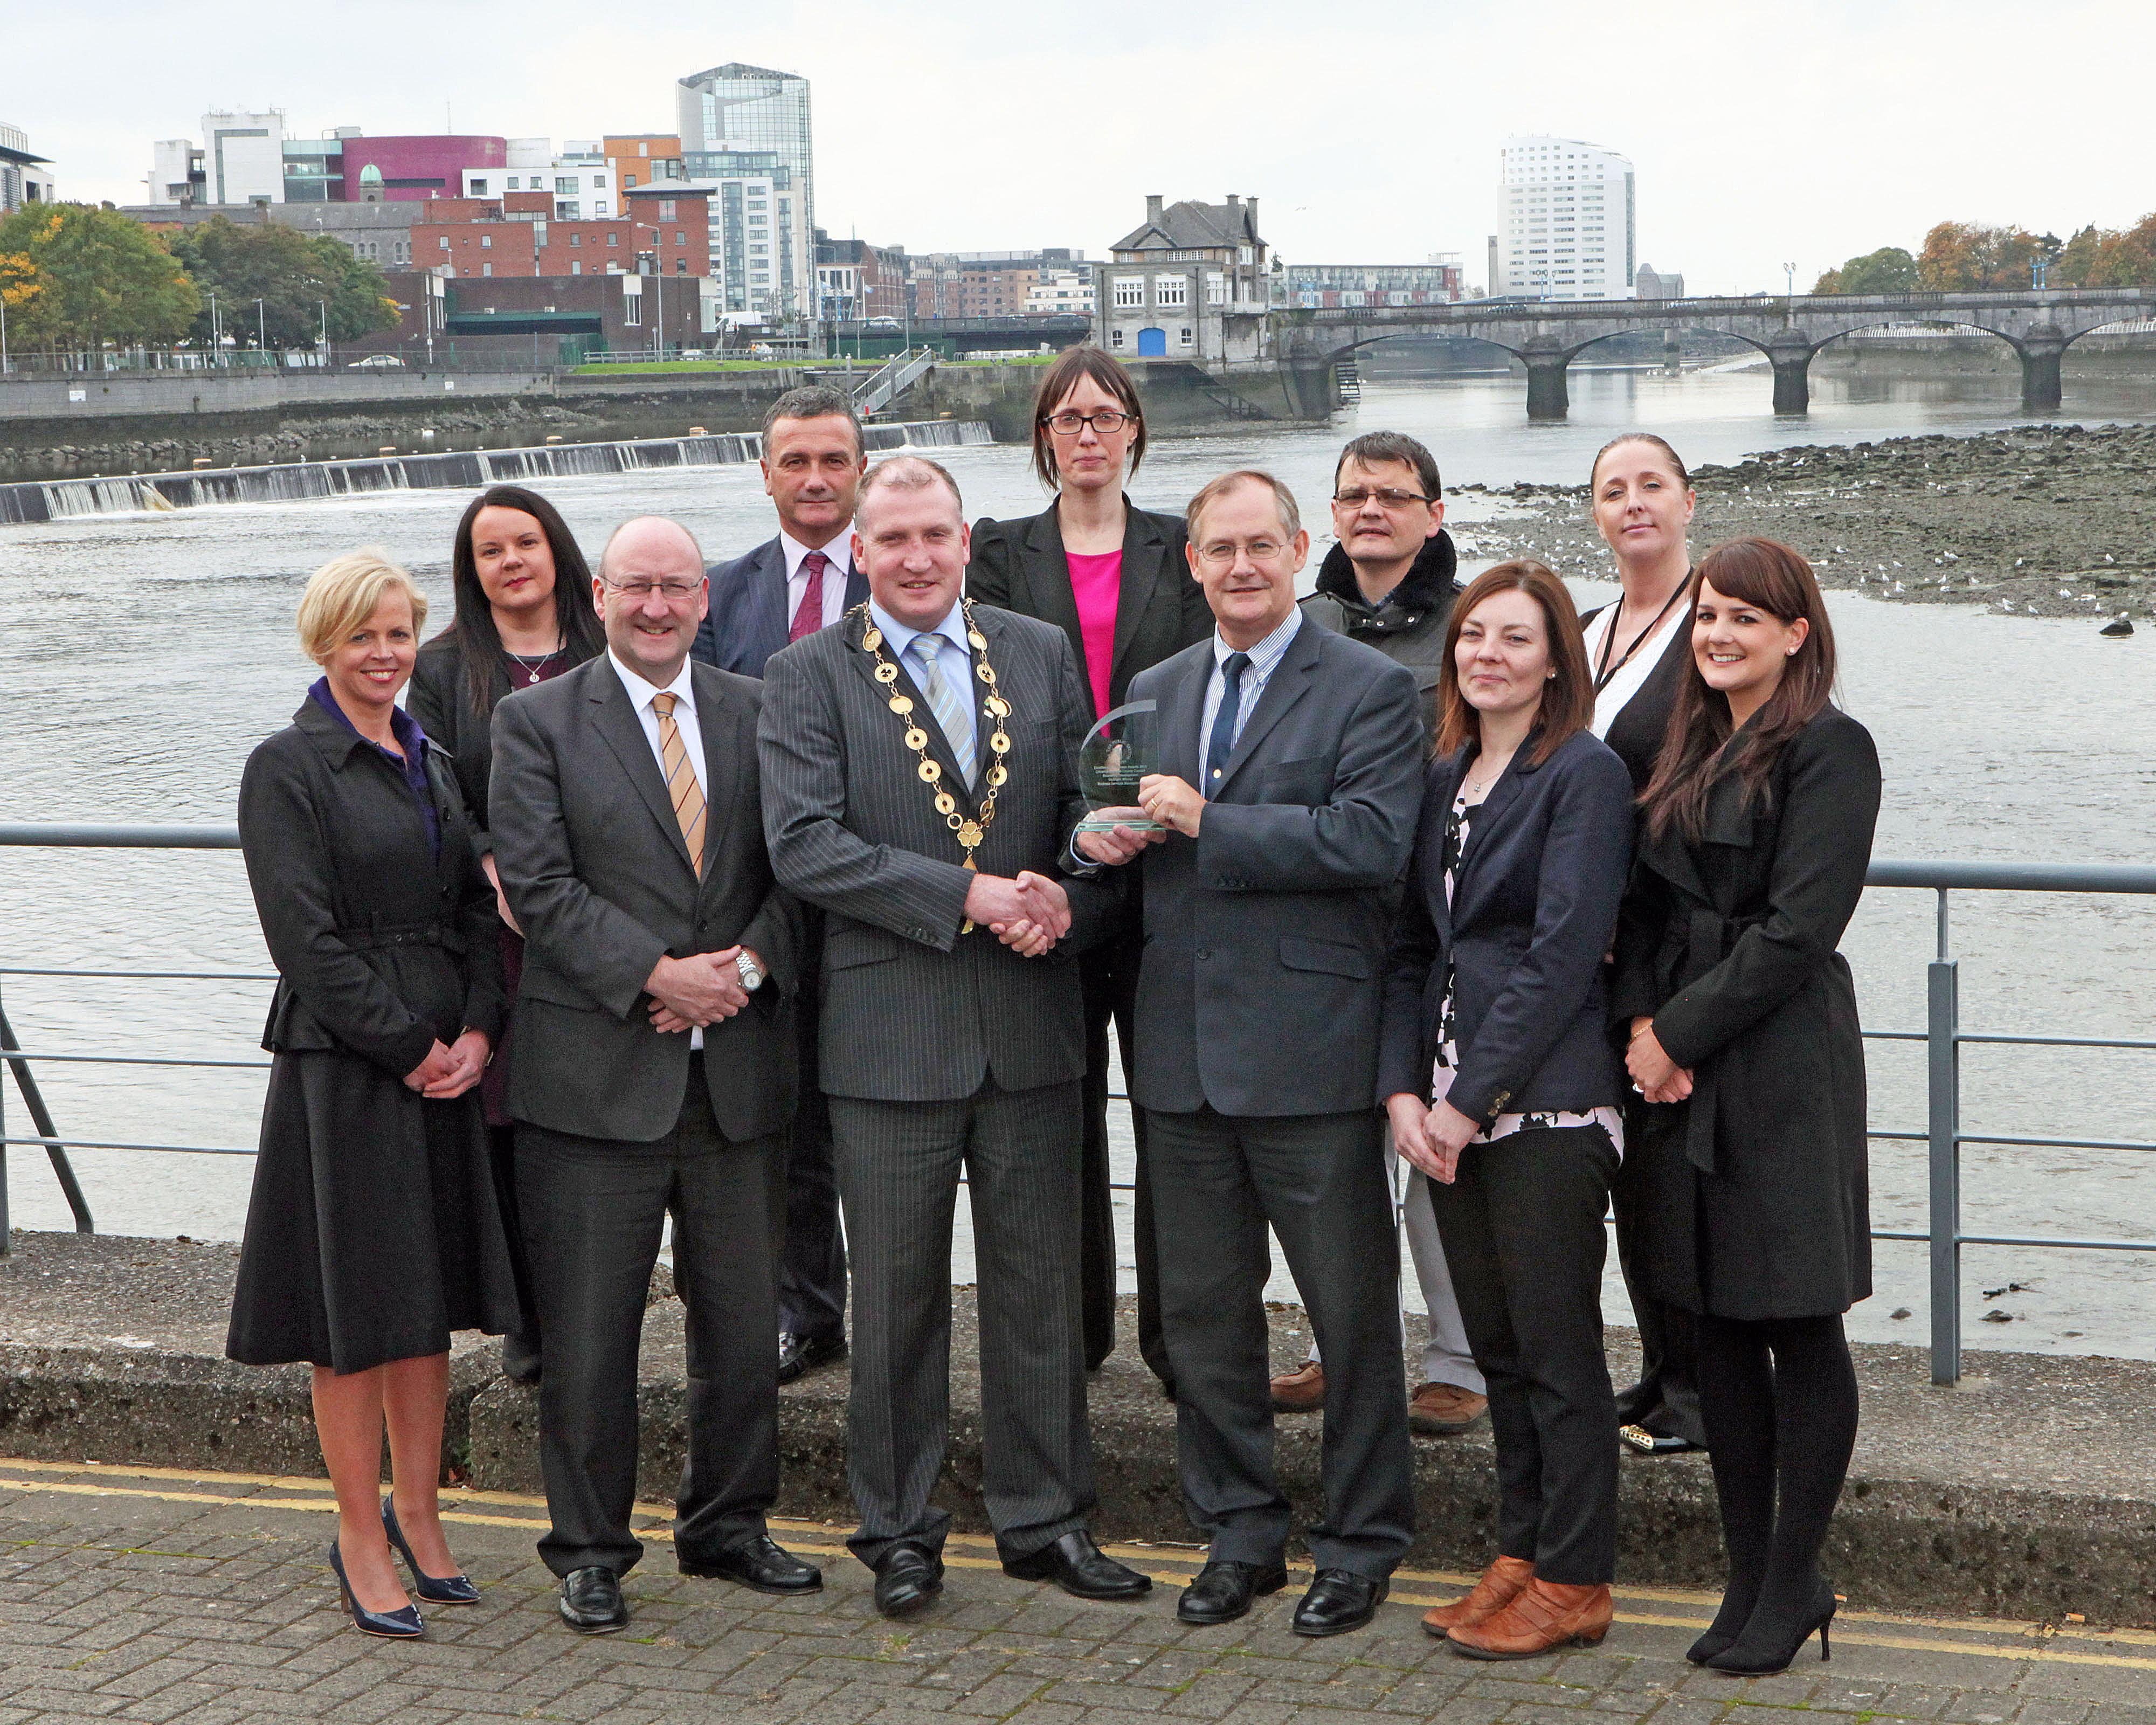 Council Wins Public Sector Magazine Award